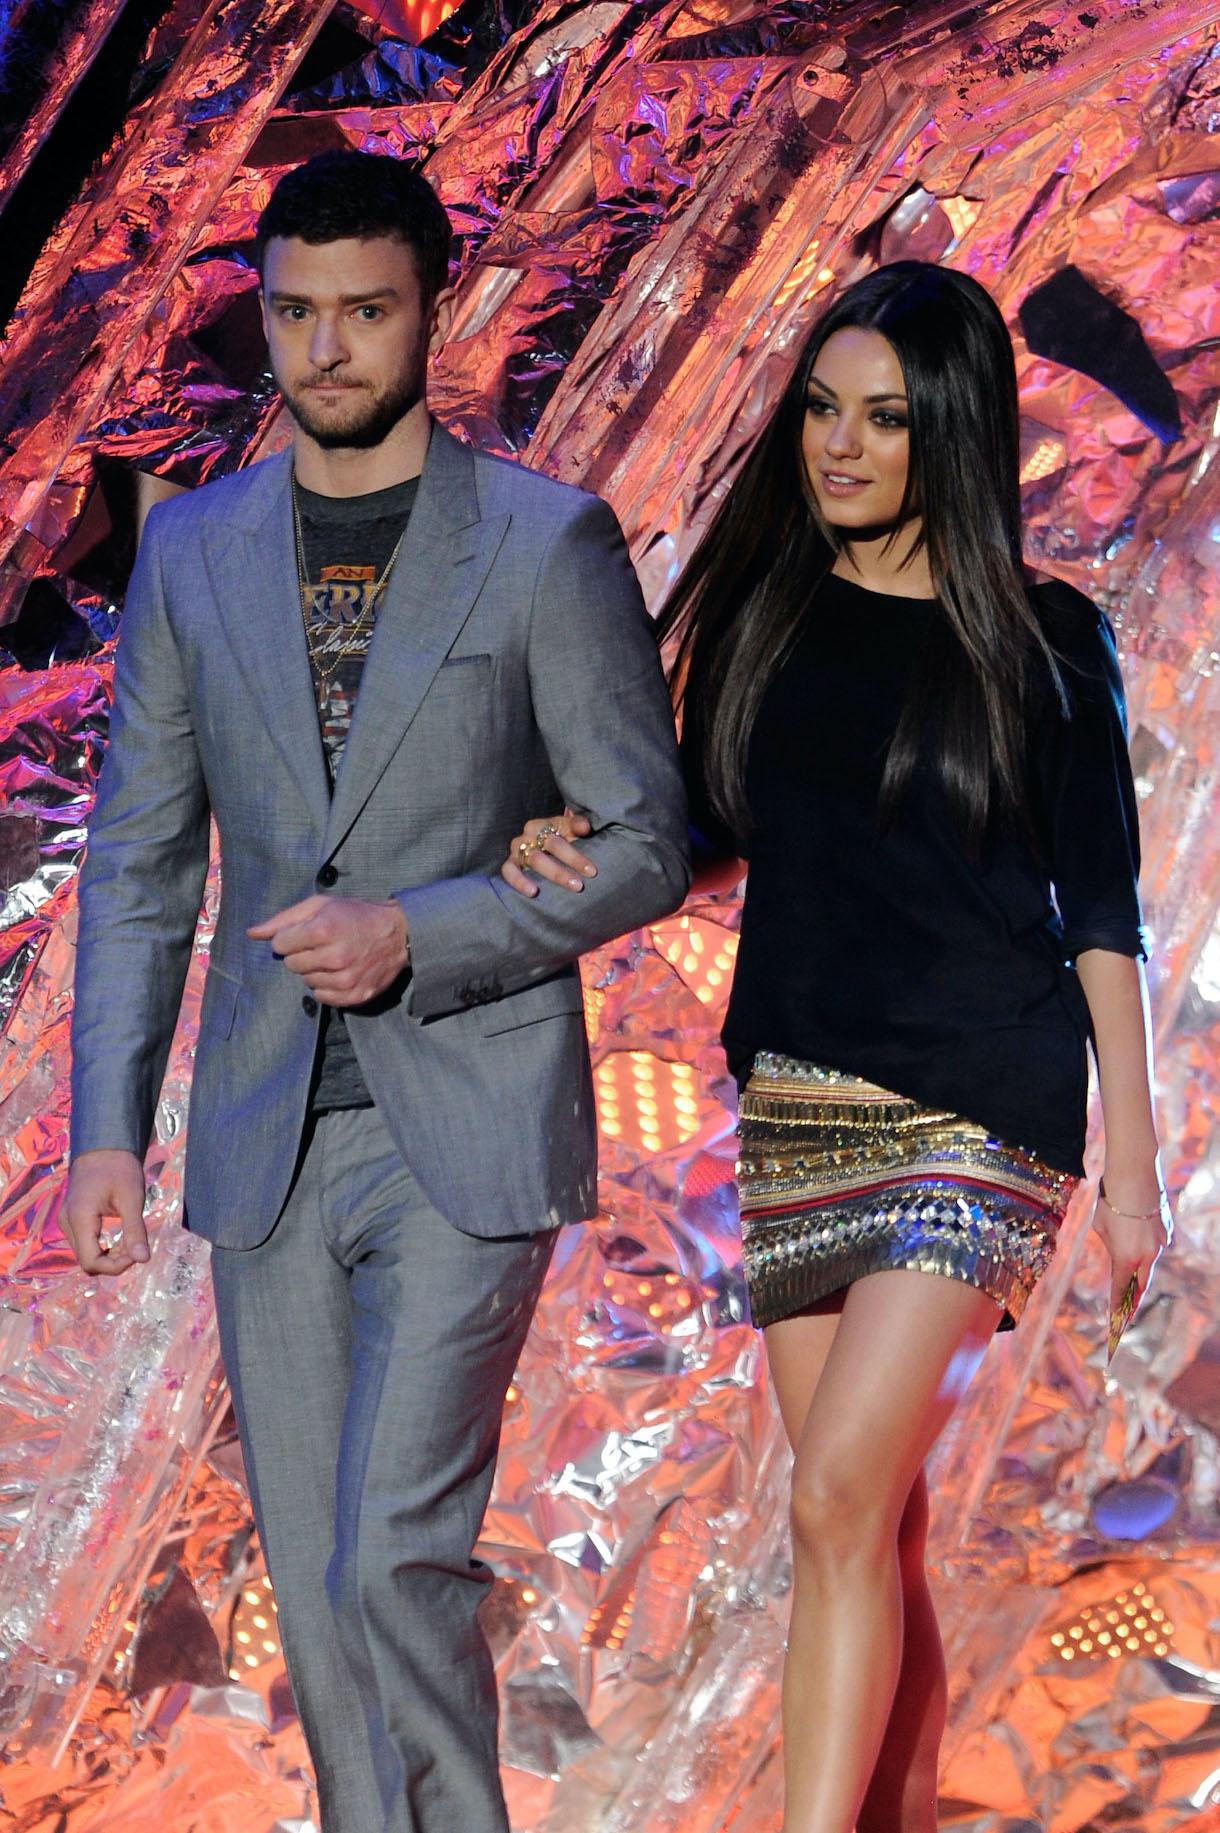 TURK - The BOUNCE: Justin Timberlake and Mila Kunis Talk